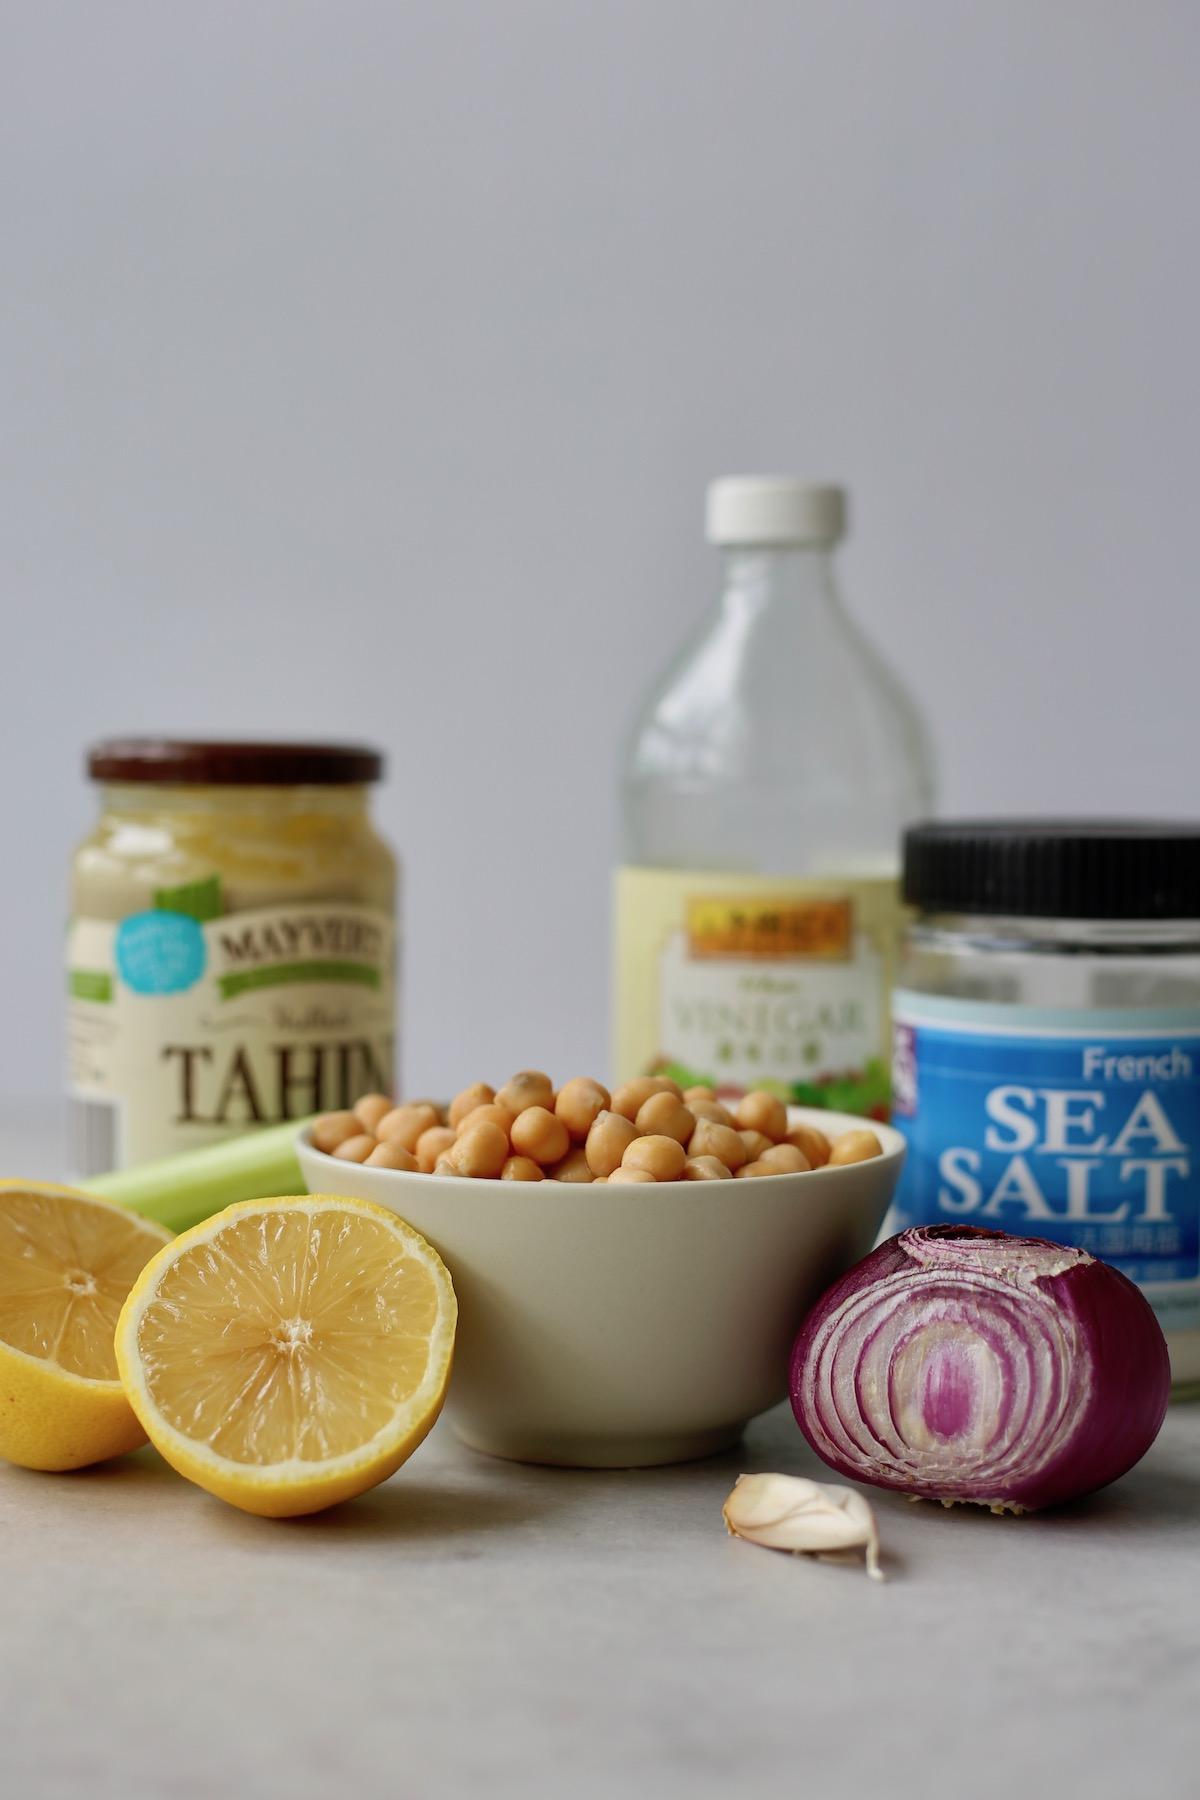 ingredients you'll need to make vegan chickpea tuna salad